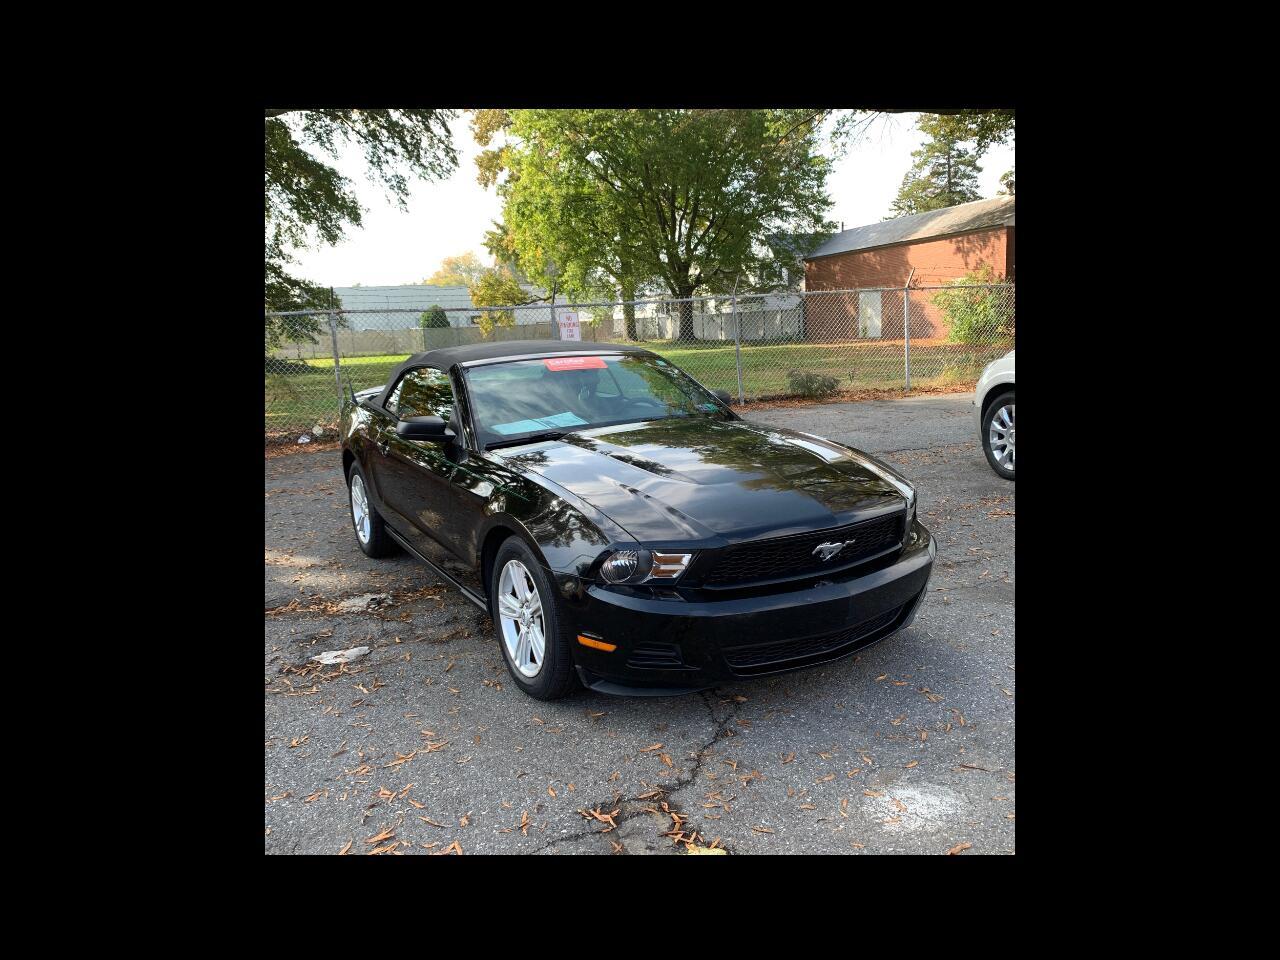 Ford Mustang V6 Convertible 2010